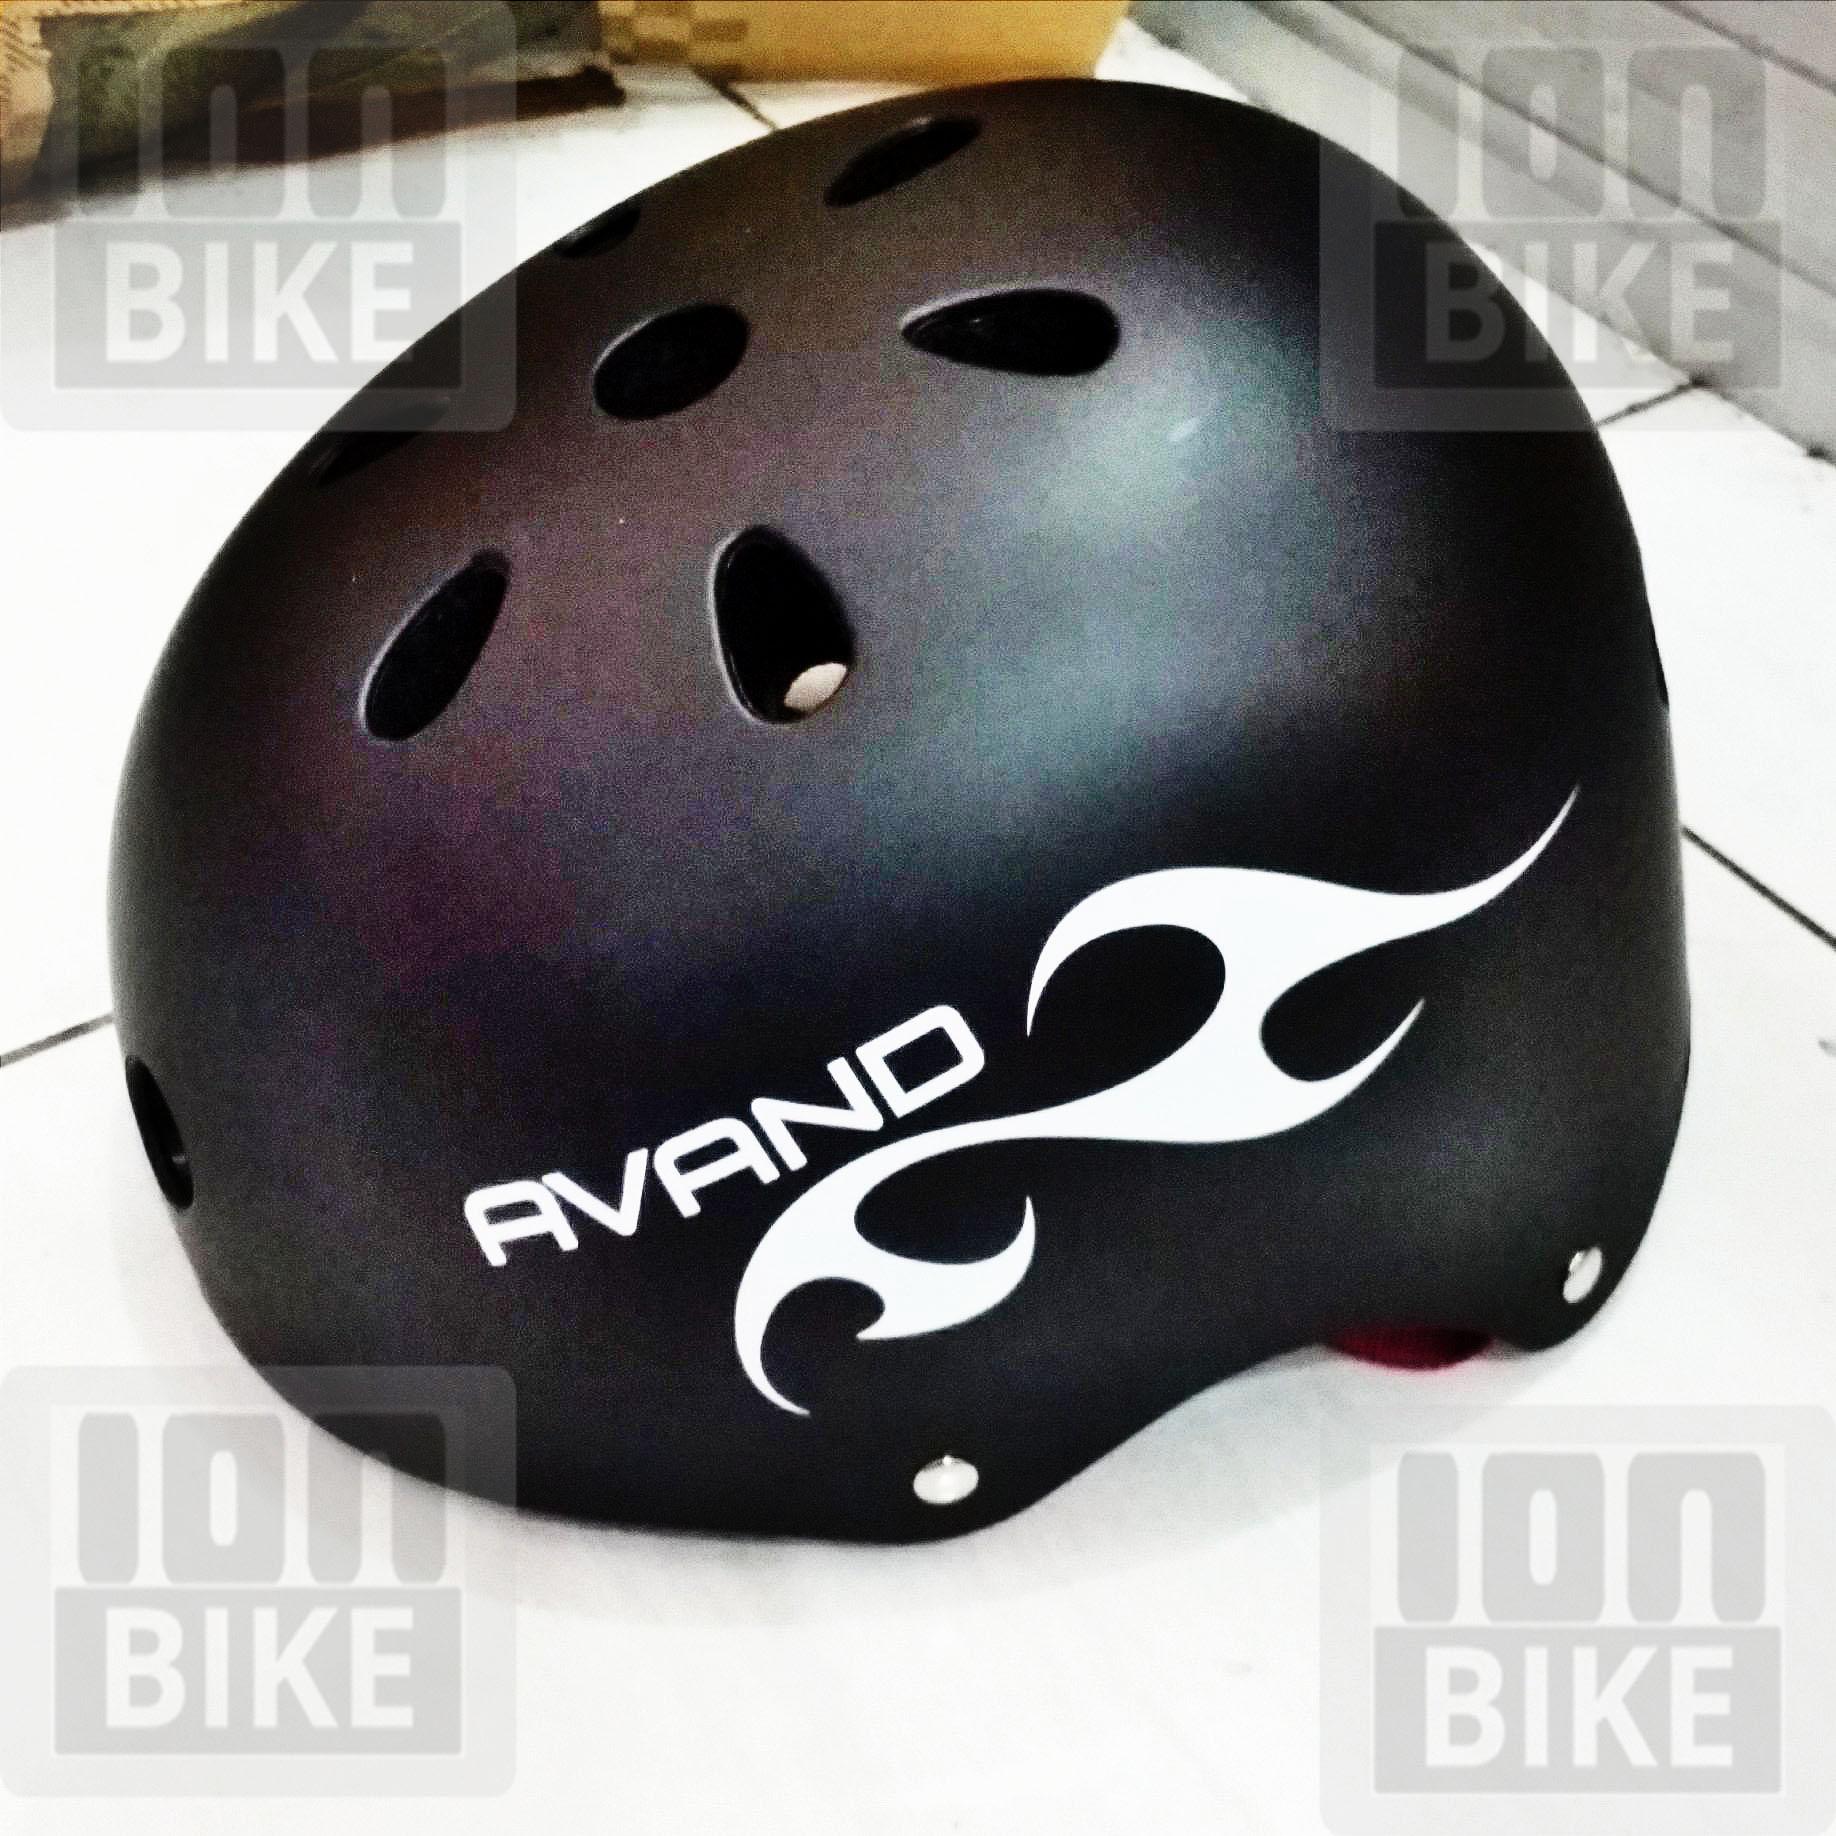 Jual Helm Sepeda Avand Batok Bmx Skate Ion Bike Jogja Tokopedia Helem